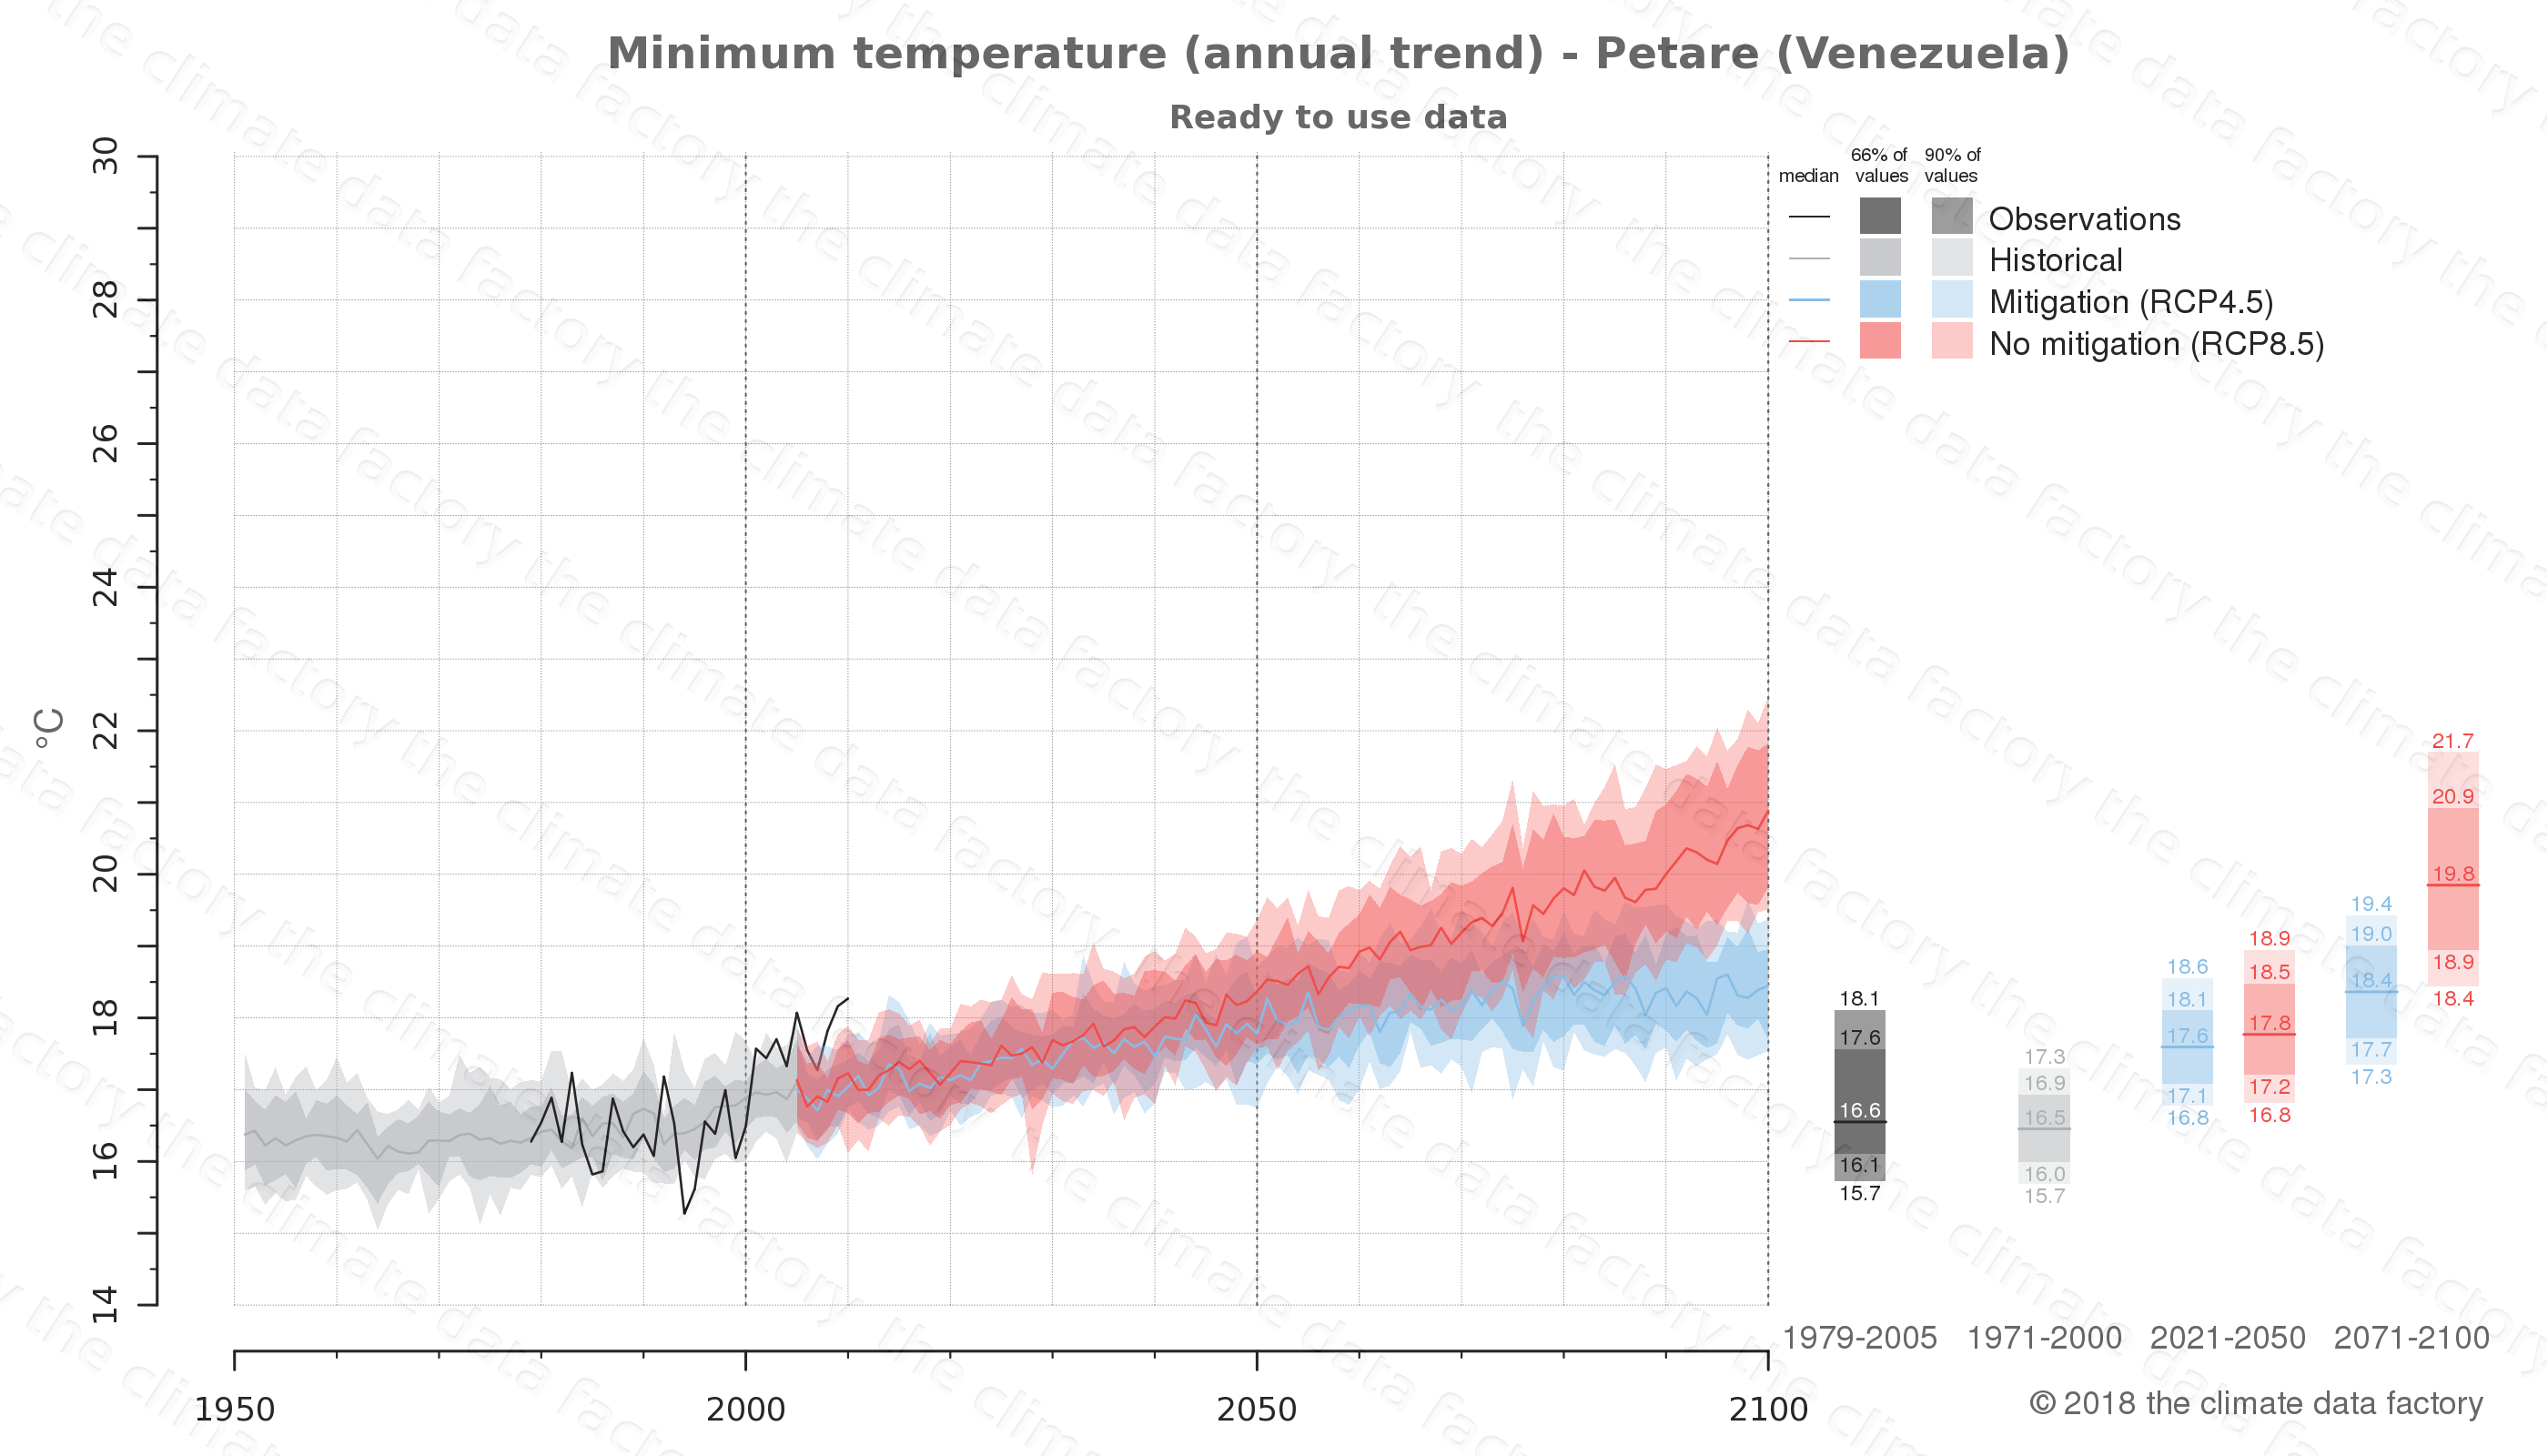 climate change data policy adaptation climate graph city data minimum-temperature petare venezuela